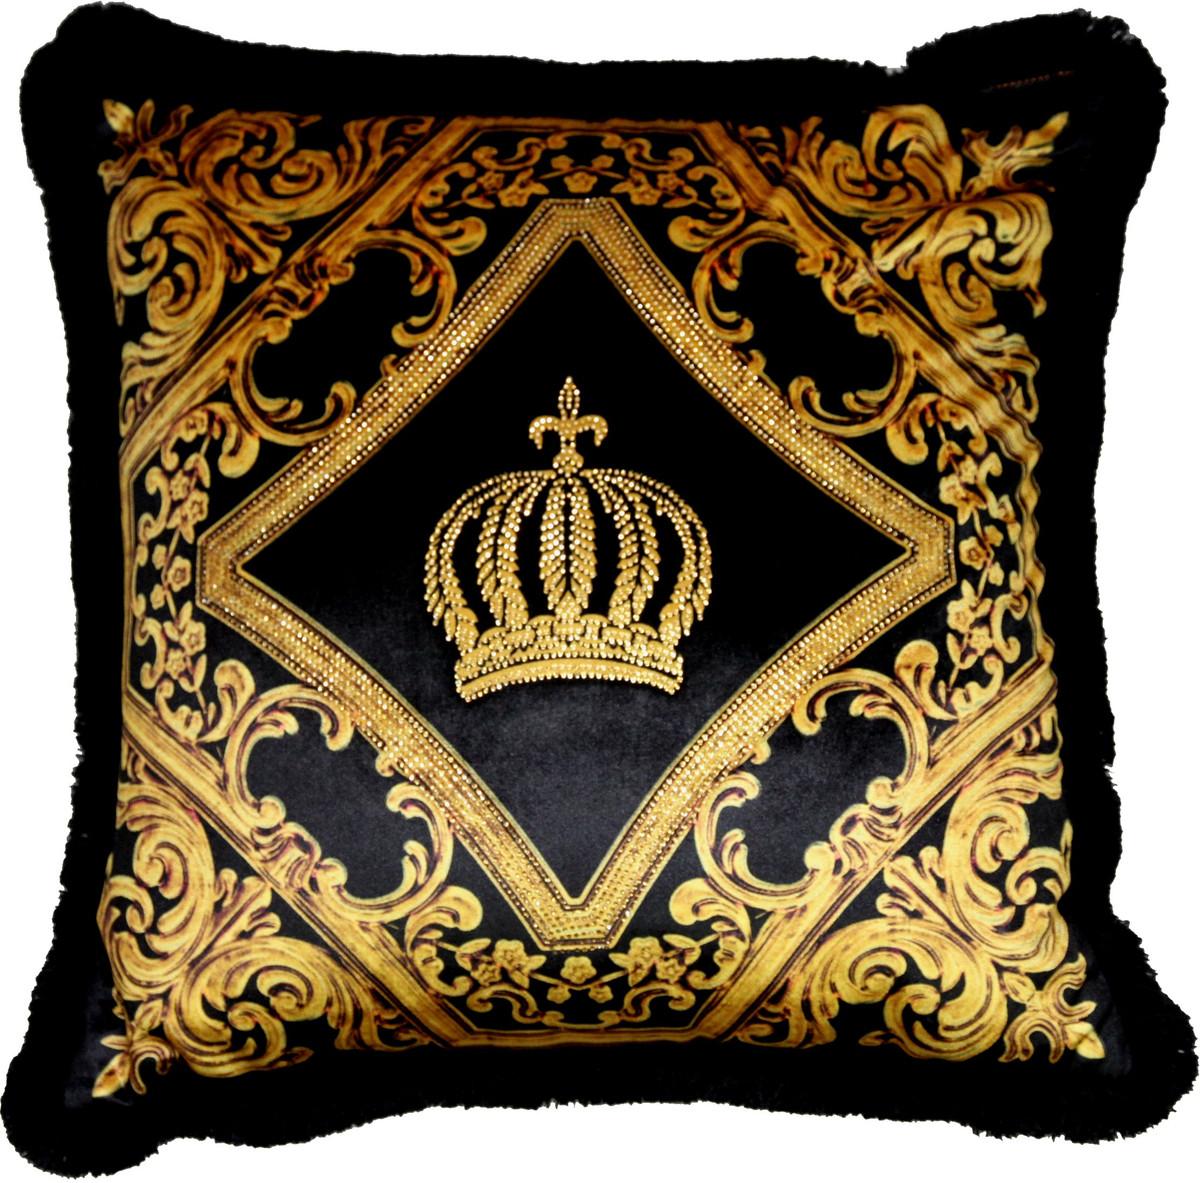 harald gl ckler luxus deko barock zierkissen pomp s by casa padrino schwarz gold krone. Black Bedroom Furniture Sets. Home Design Ideas